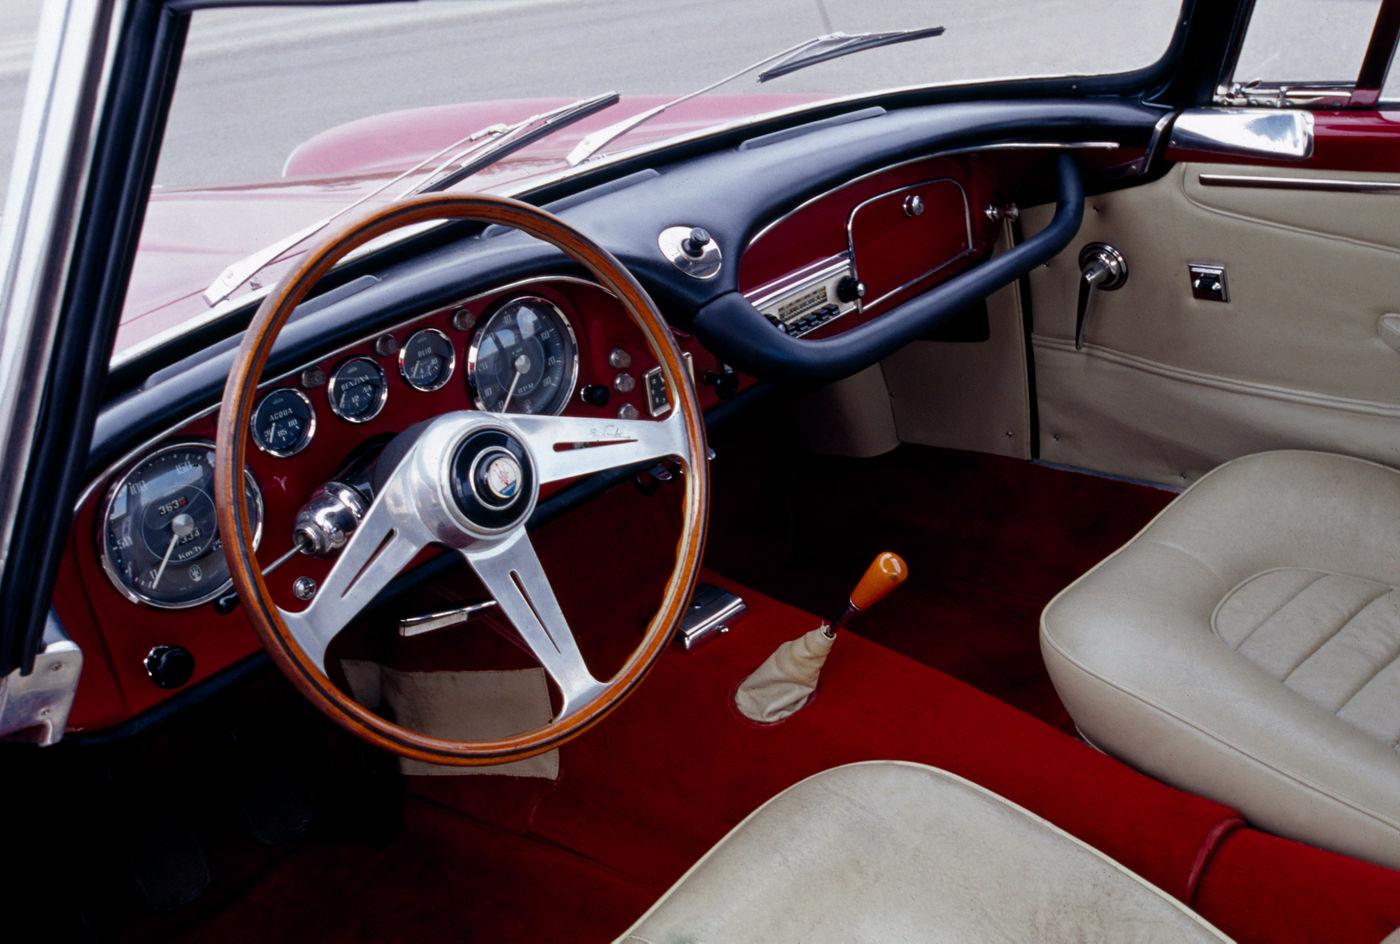 1957 Maserati 3500GT - interior of the classic car model in red